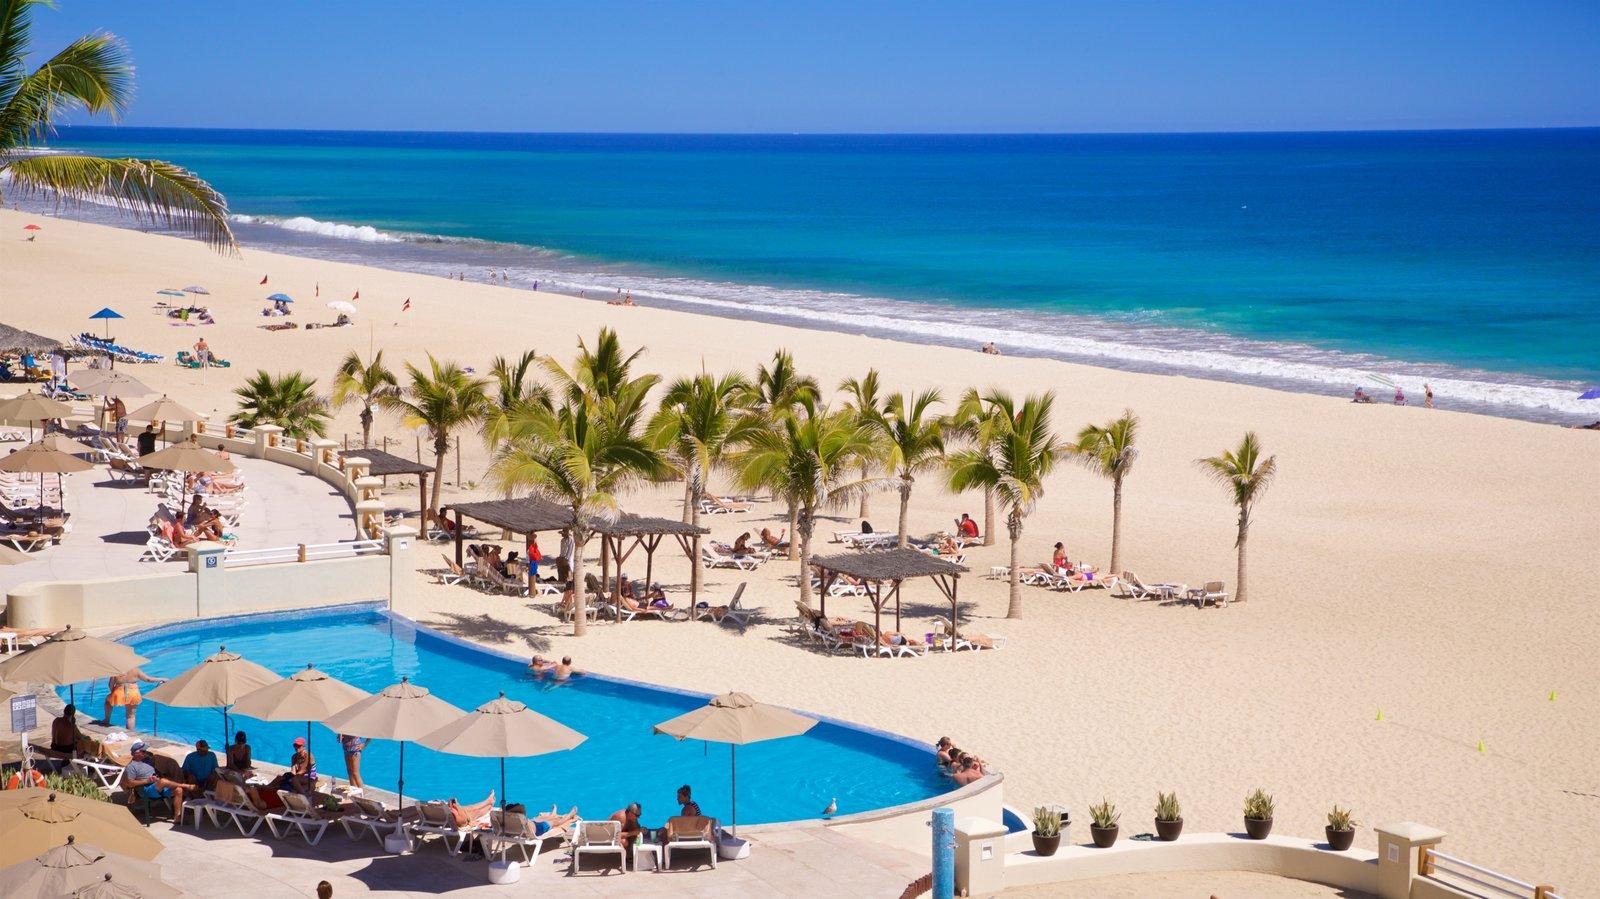 Zona Hotelera featuring general coastal views, a sandy beach and tropical scenes